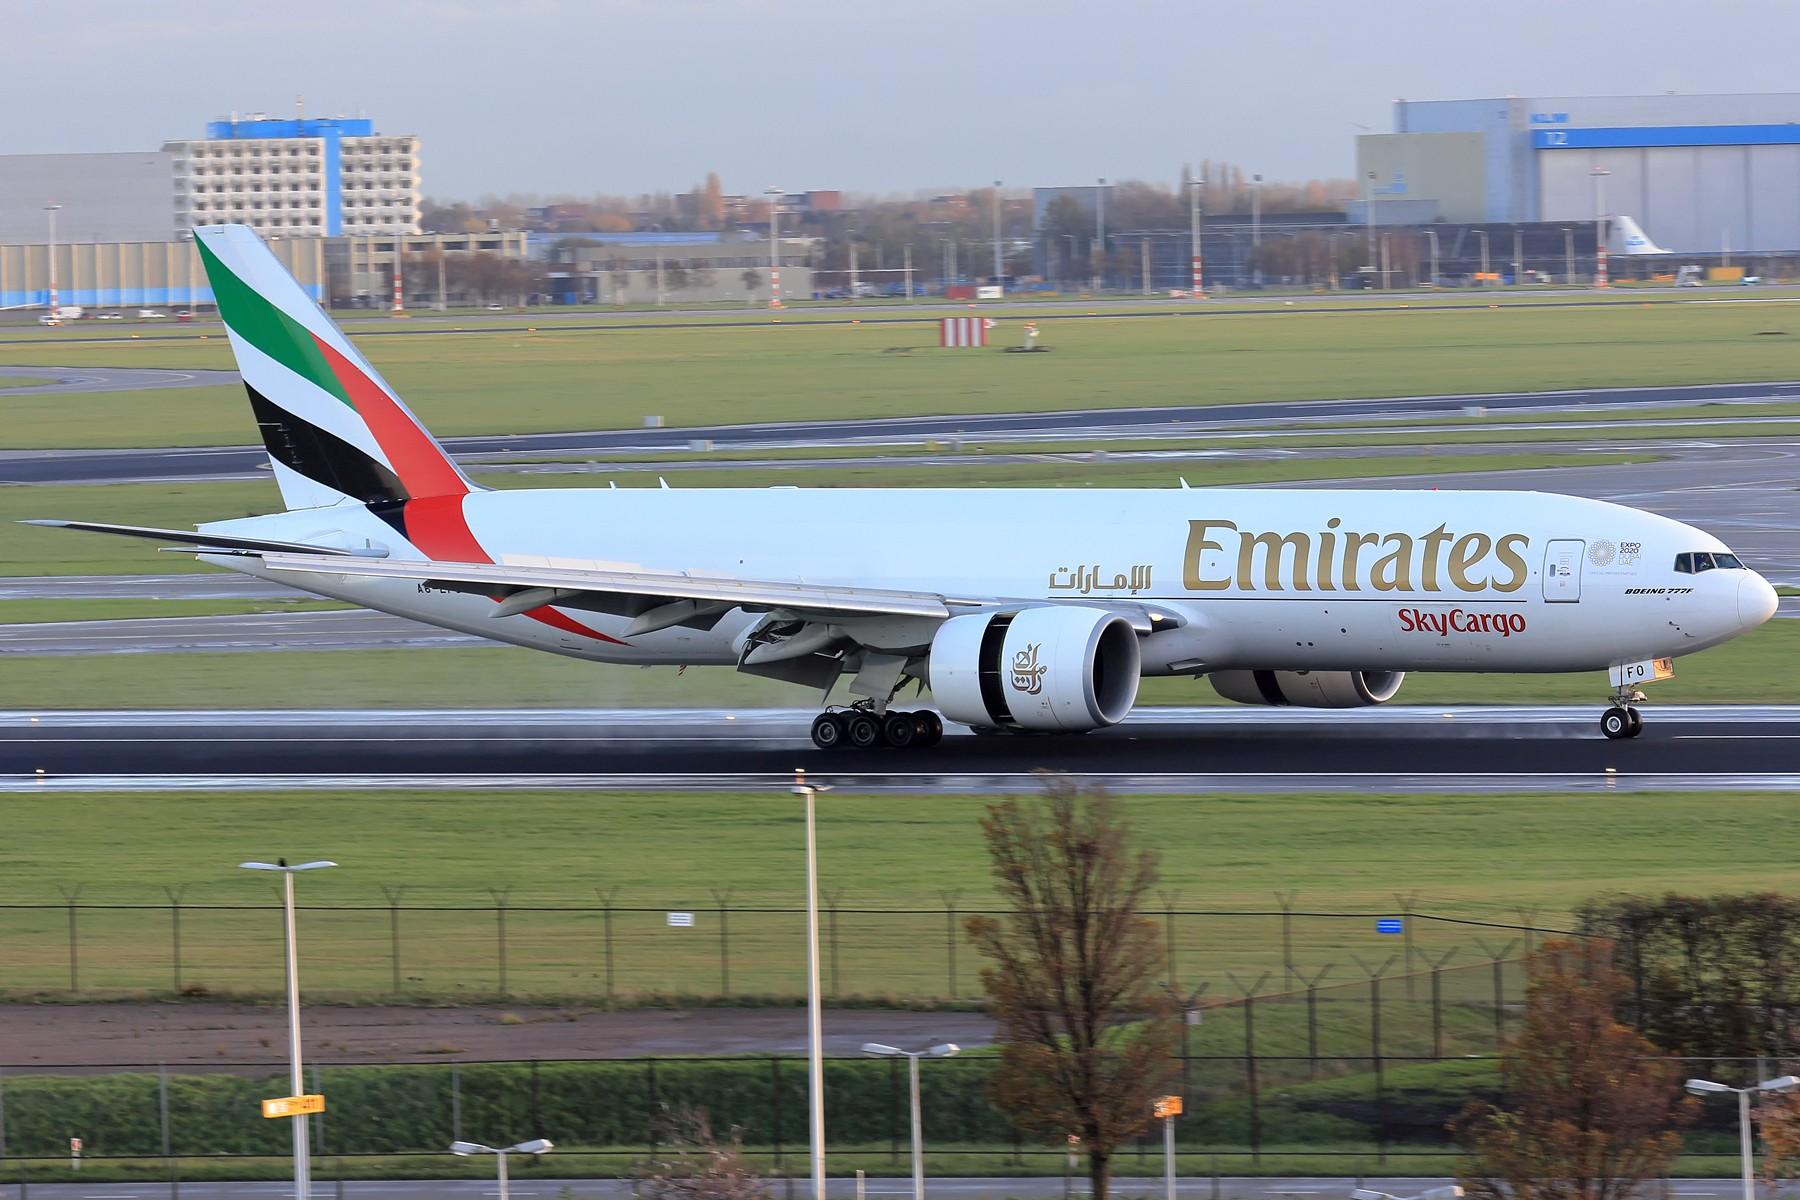 Re:[原创]【AMS】伪塔台视角吹水几张 1800大图 BOEING 777-200 A6-EFO 荷兰阿姆斯特丹史基浦机场